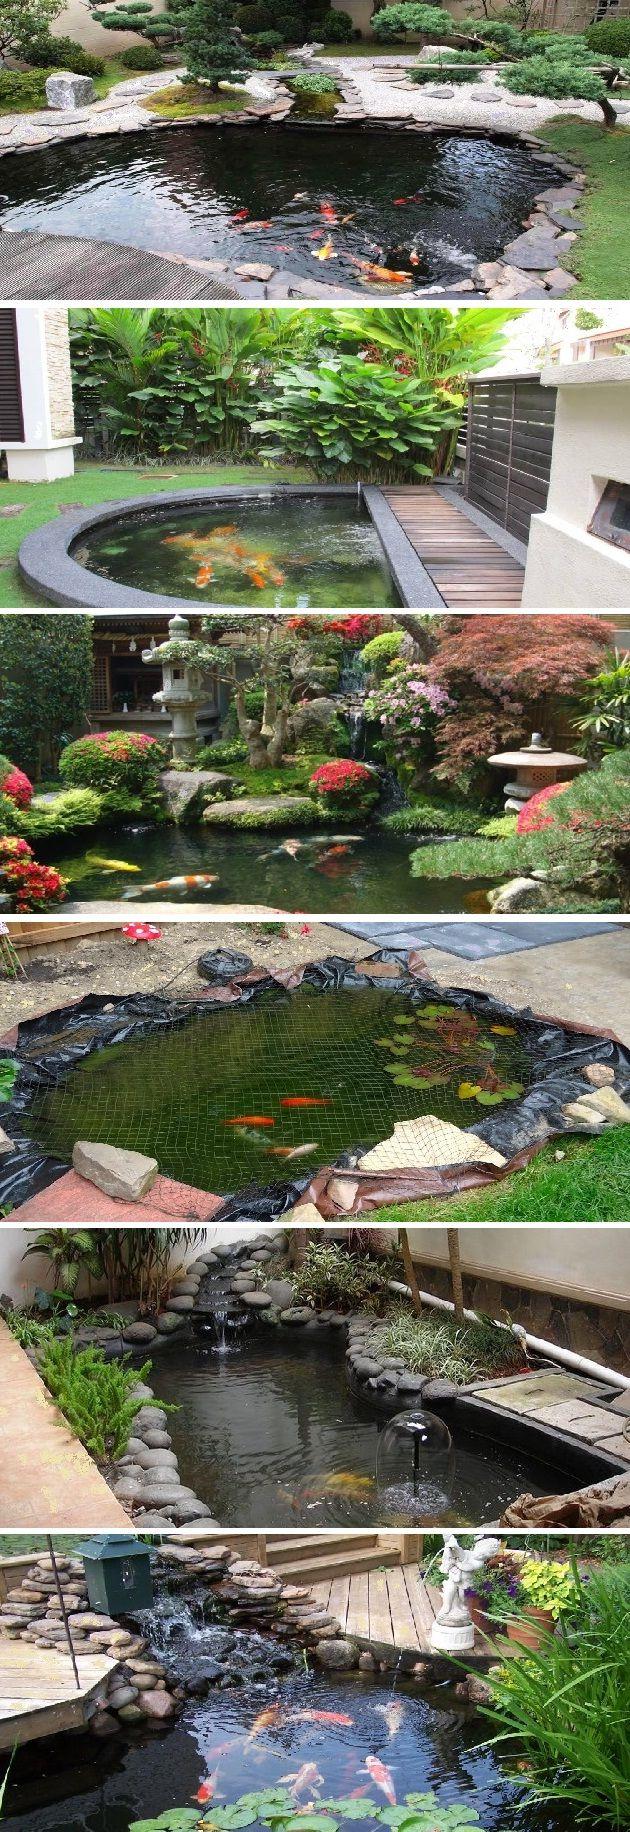 Best 25 koi ponds ideas on pinterest fish ponds pond for Small koi fish care